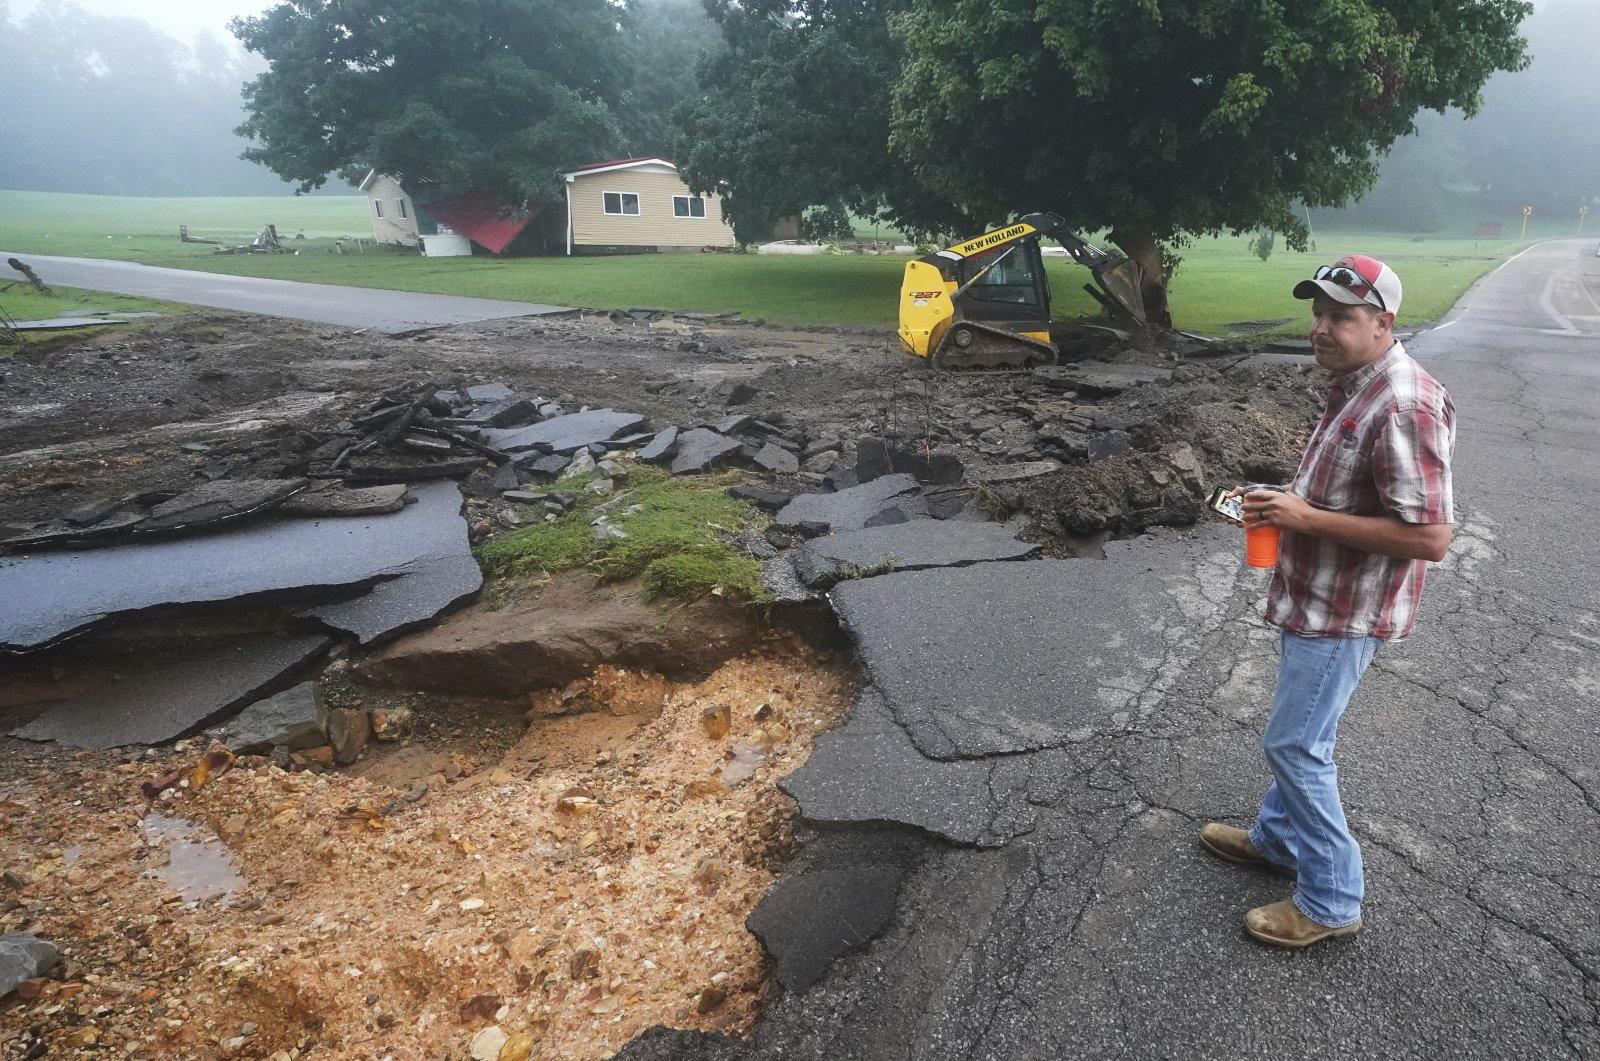 Michael Pate watches as a road is repaired in McEwen, Tenn., U.S., Aug. 22, 2021. (AP Photo)